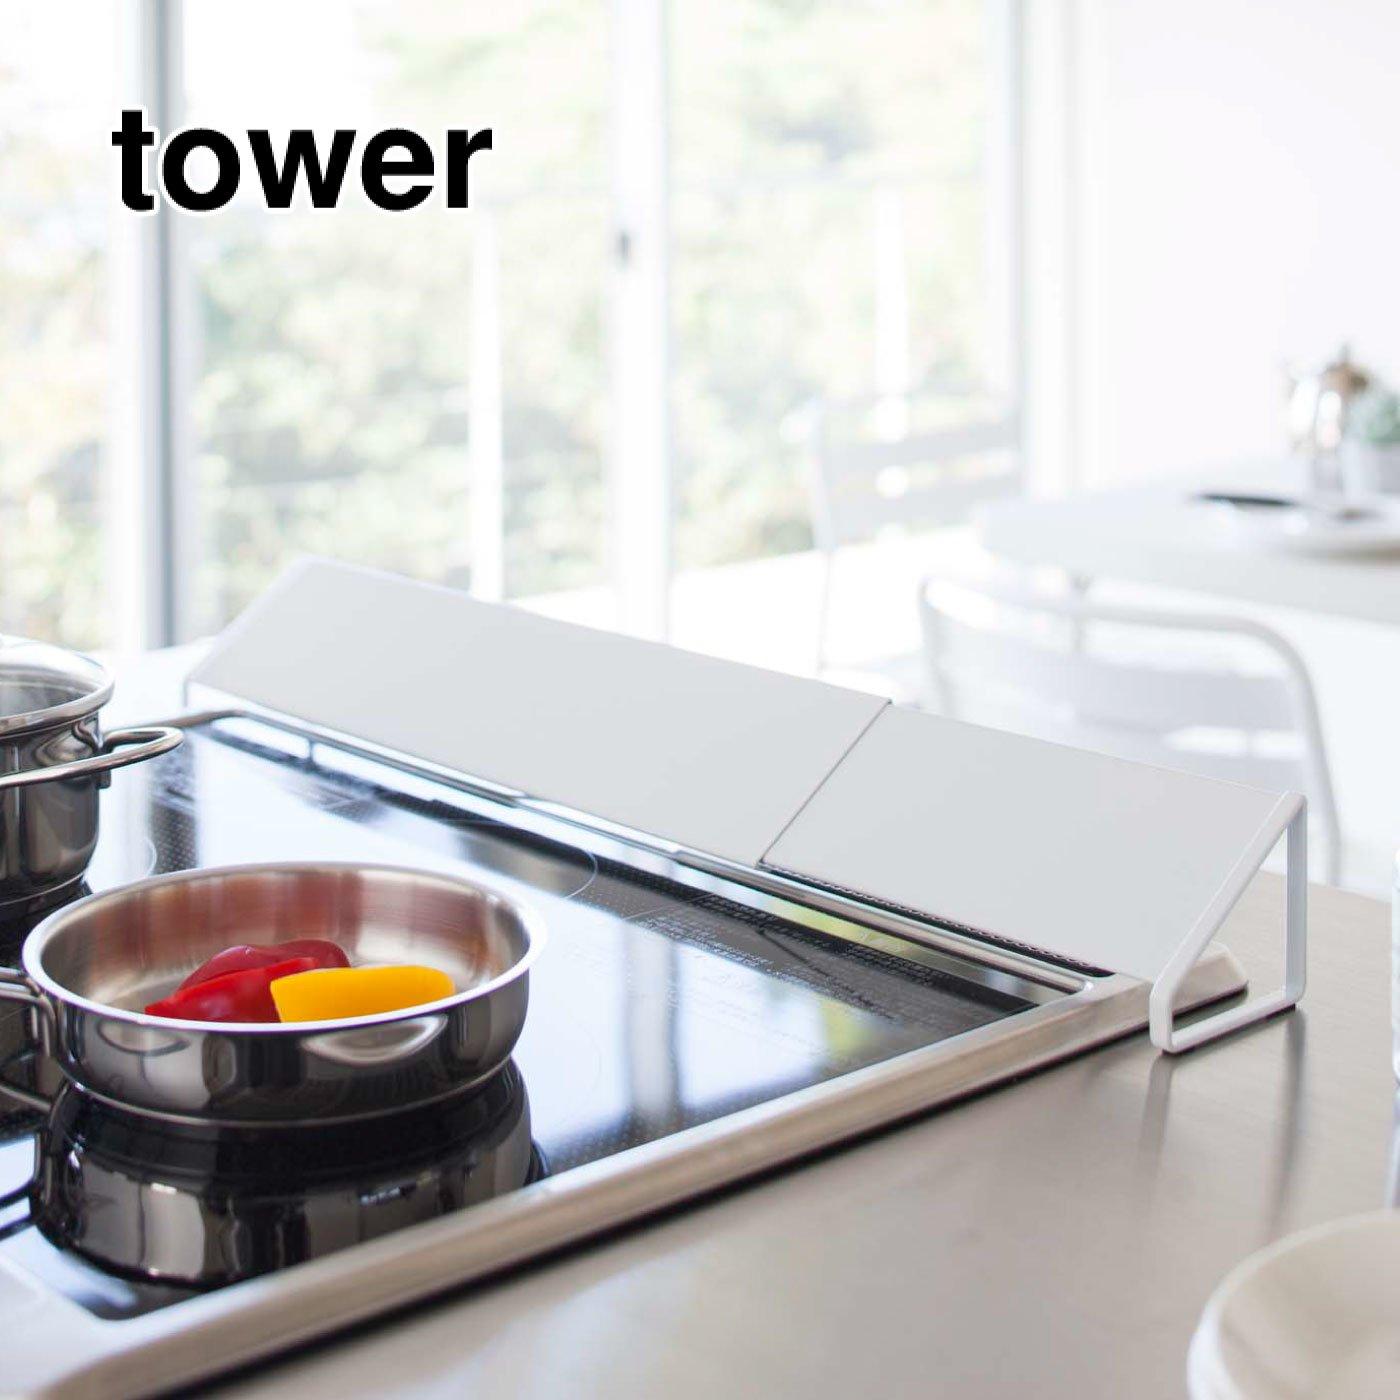 tower キッチングリル排気口カバー